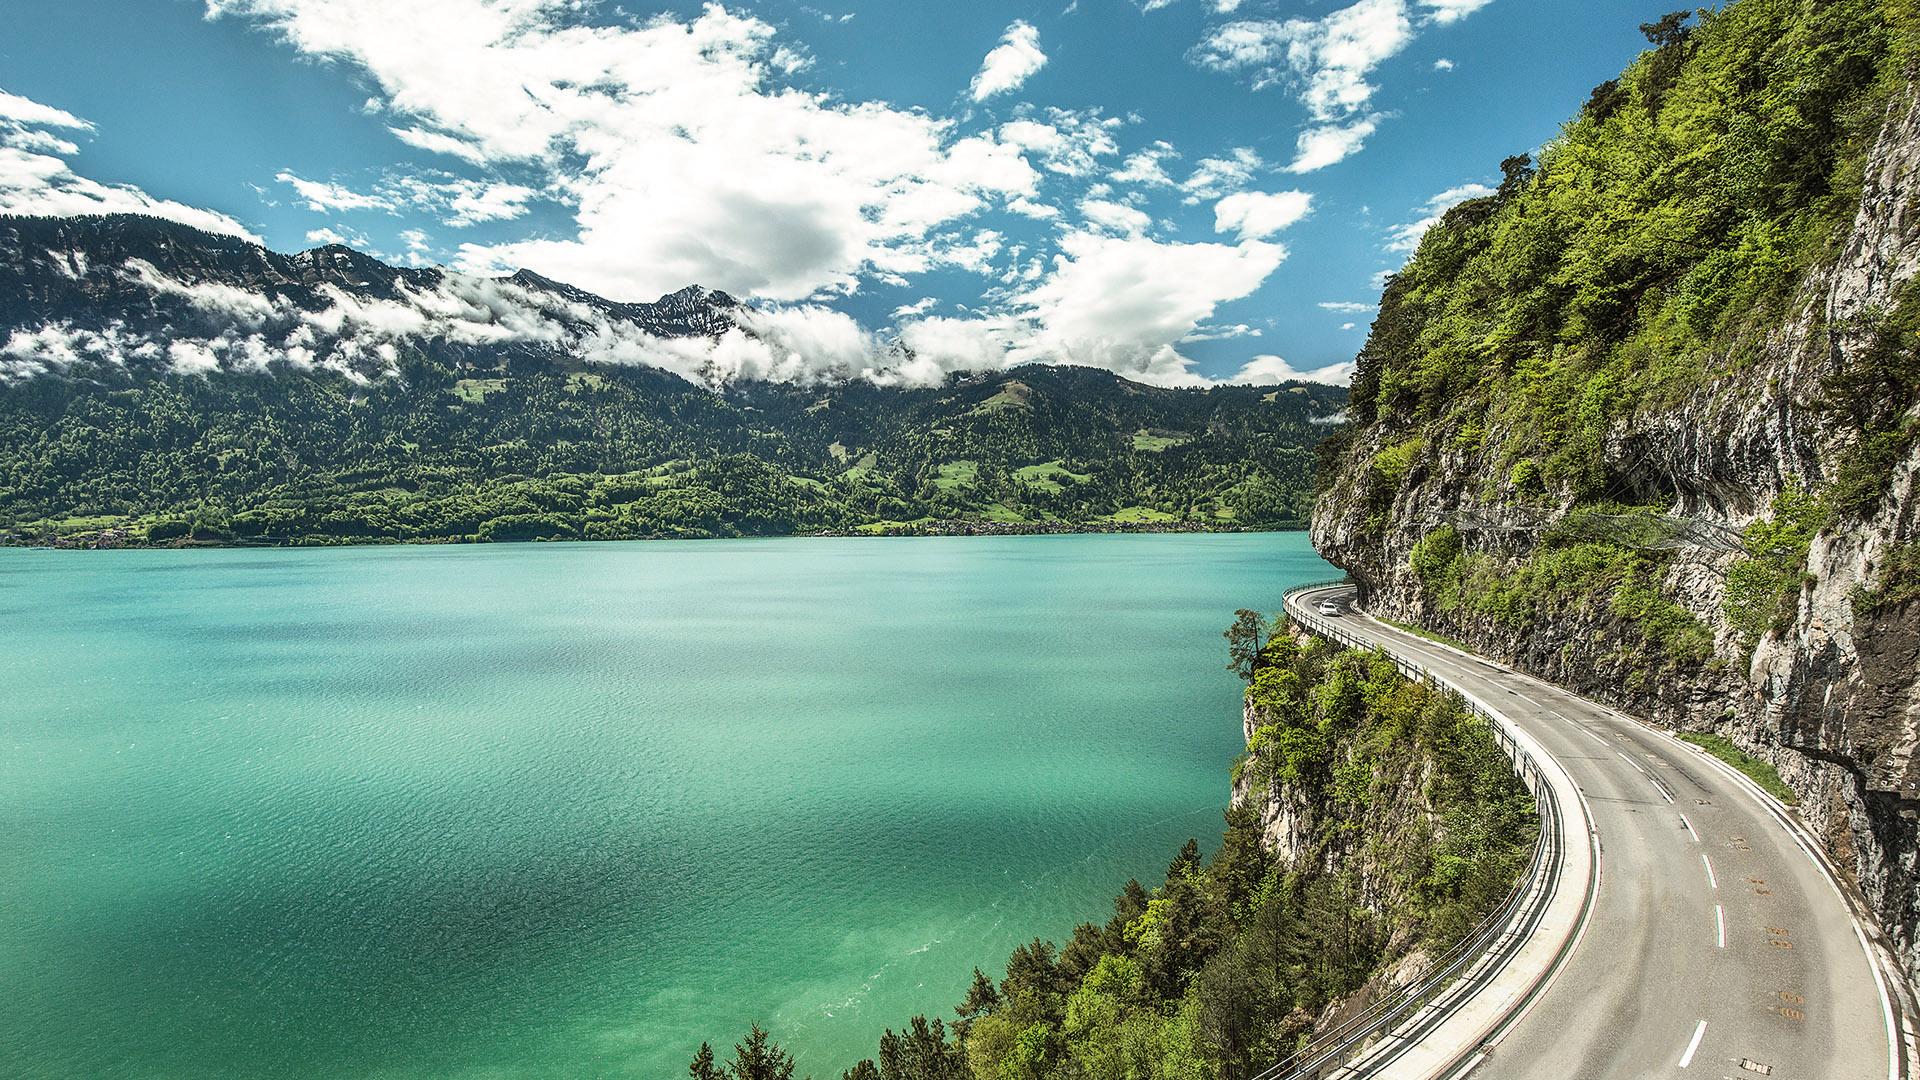 Tourabschnitt 5 - Davos-Lugano